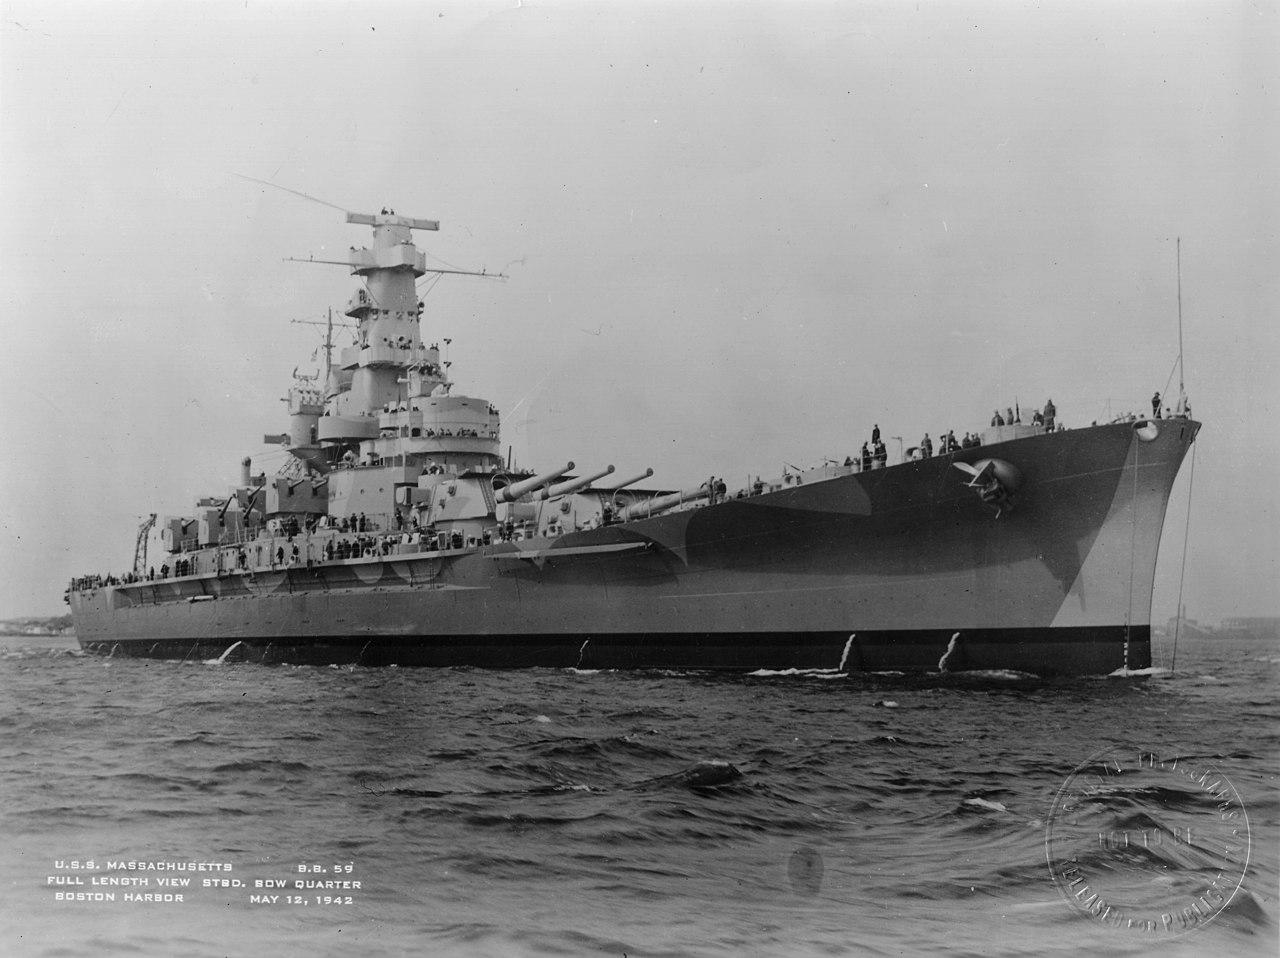 File:USS Massachusetts BB-59 5-12-1942 Boston Harbor.jpg - Wikipedia